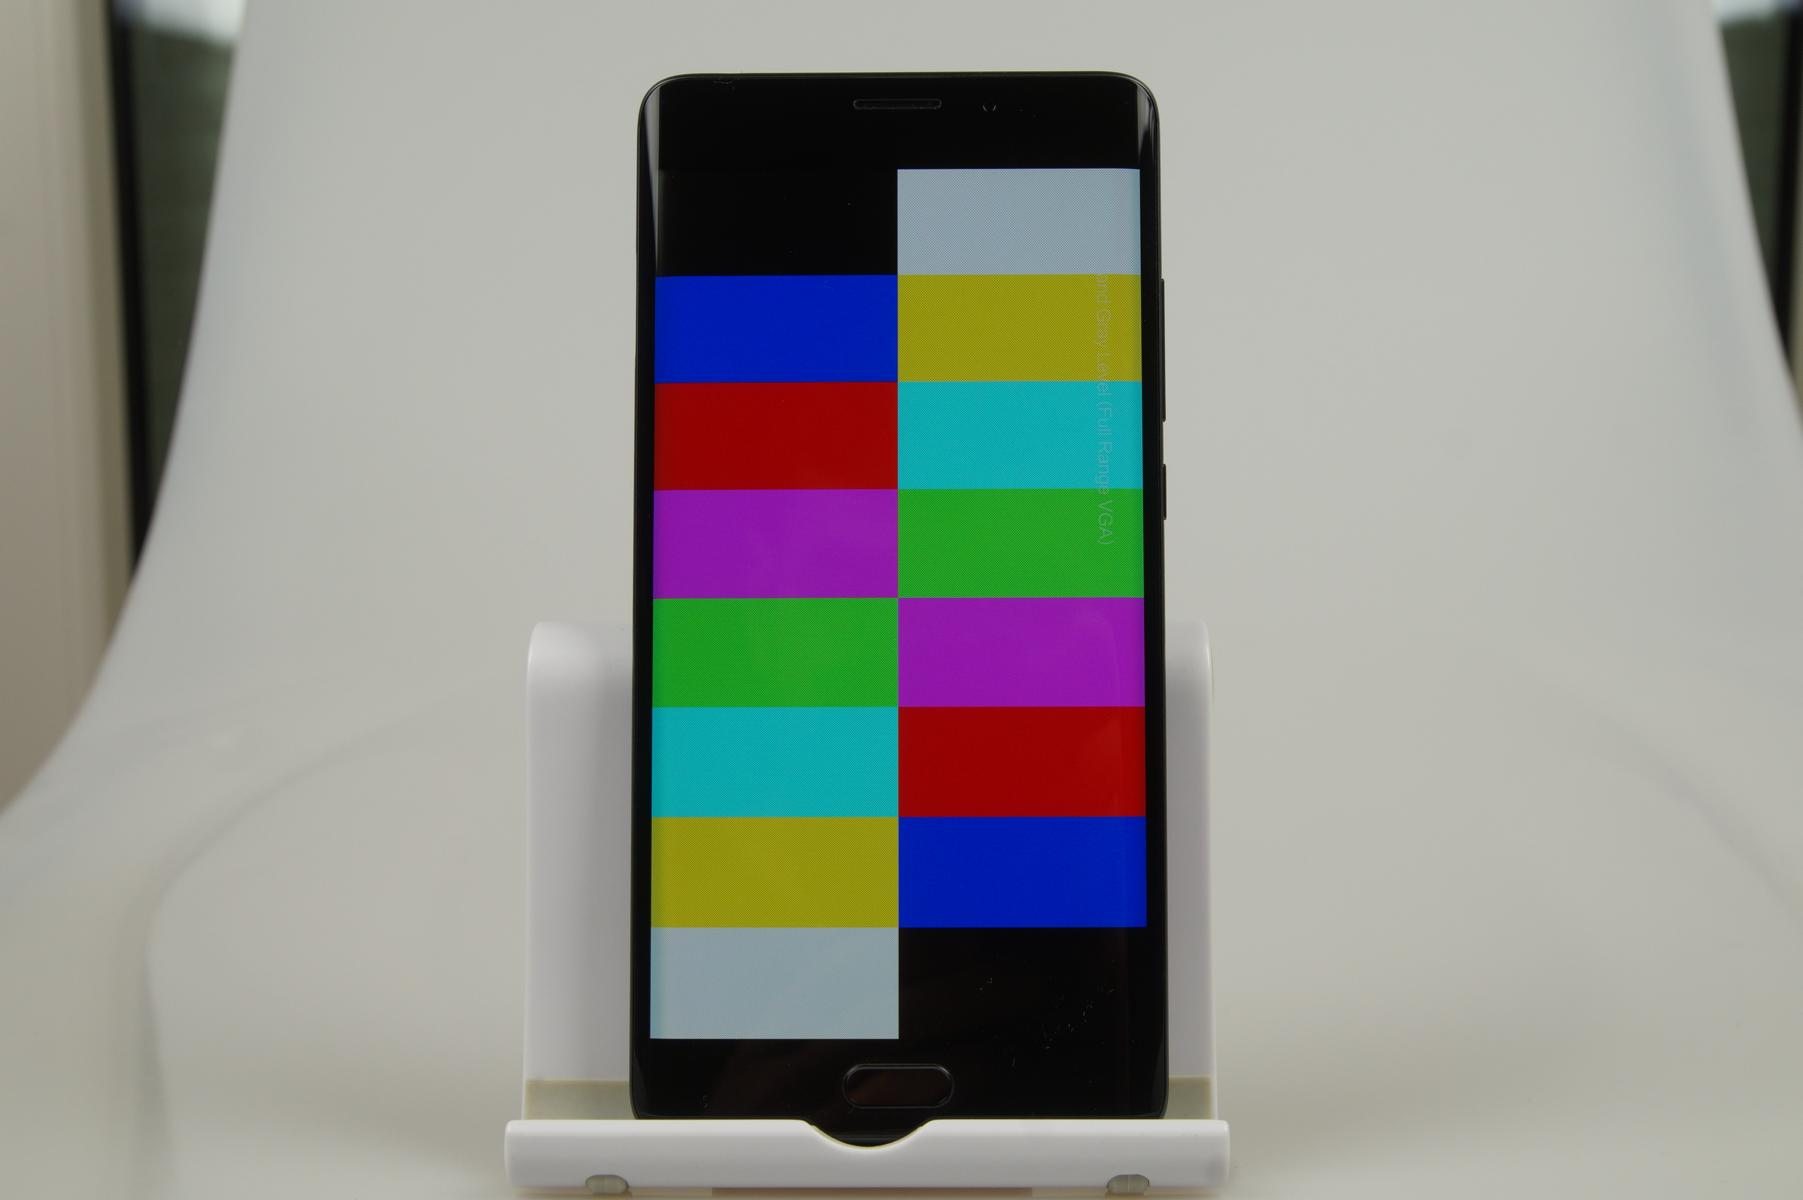 xiaomi-mi-note-2-curved-display-3